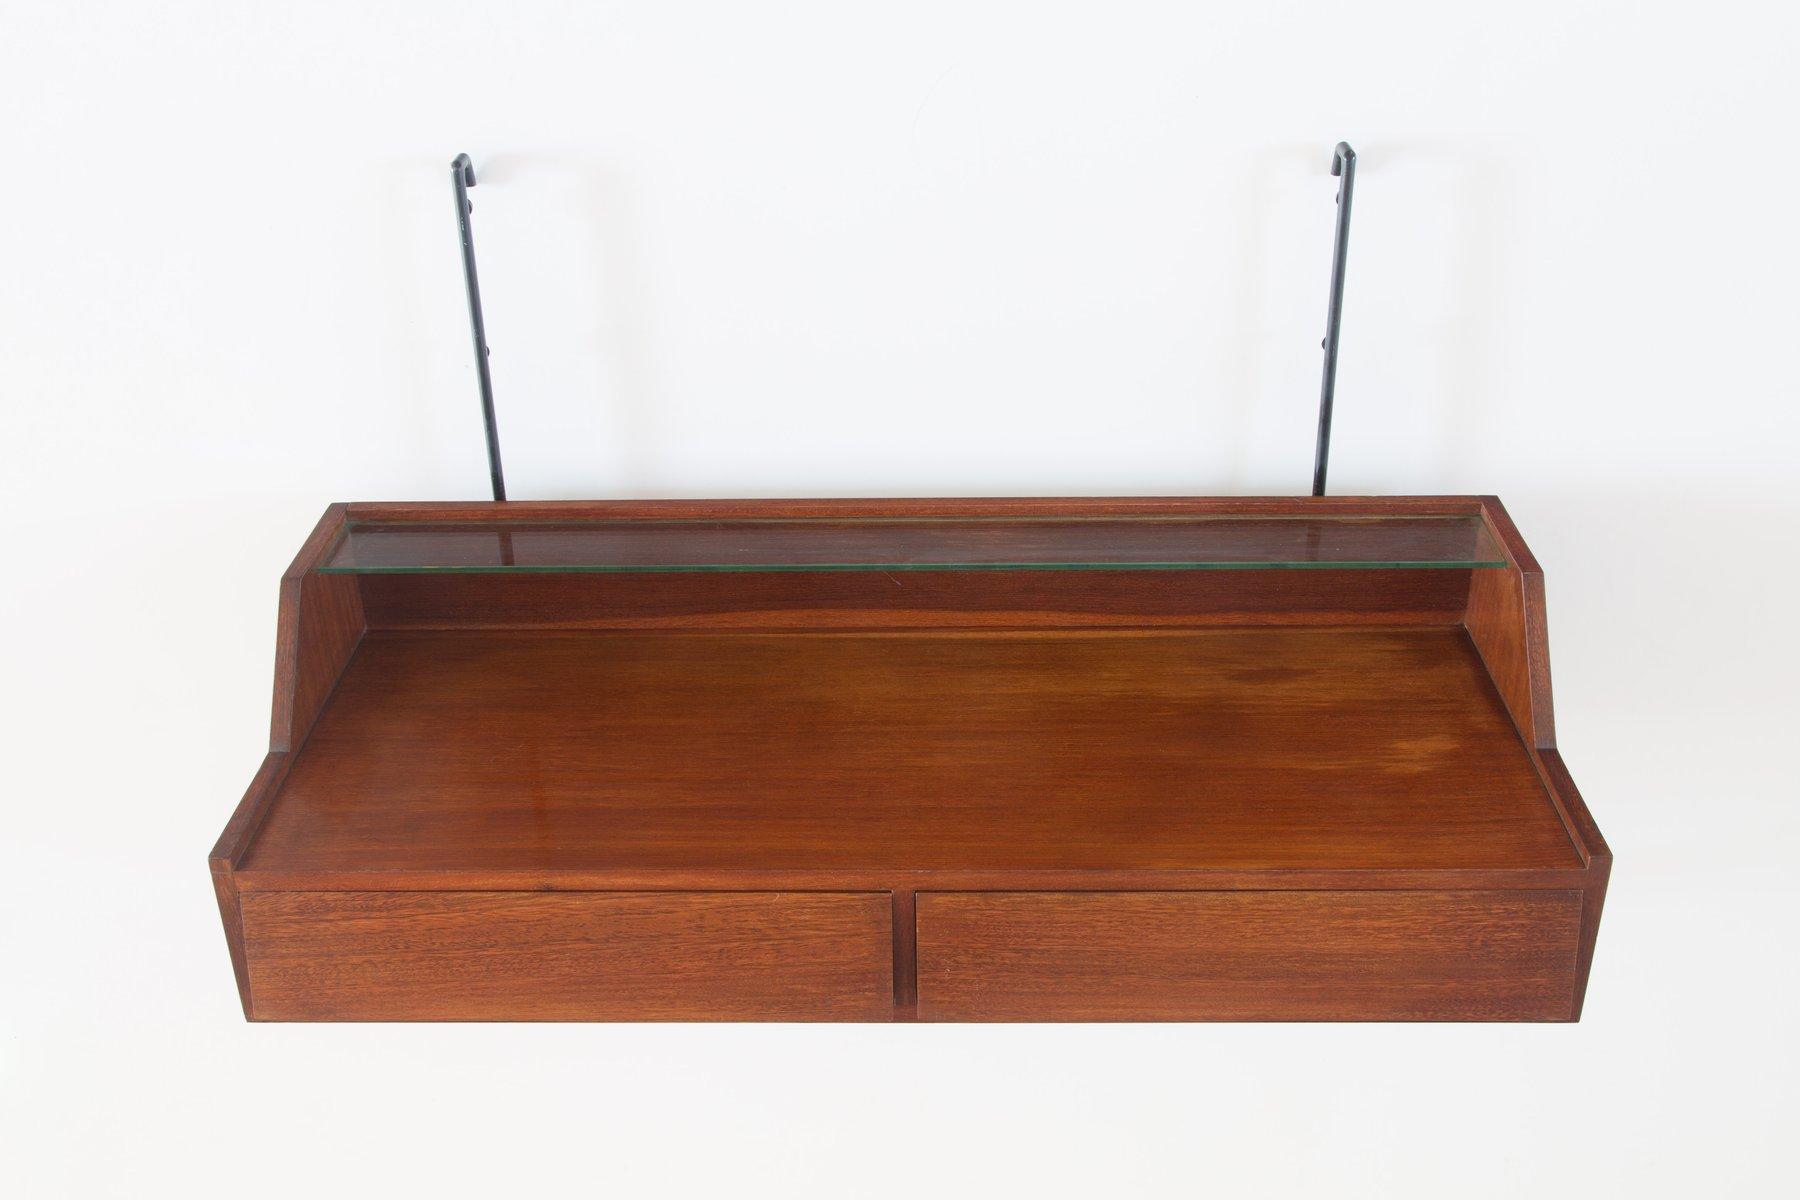 bureau suspendu par sergio conti marisa forlani et luciano grassi en vente sur pamono. Black Bedroom Furniture Sets. Home Design Ideas